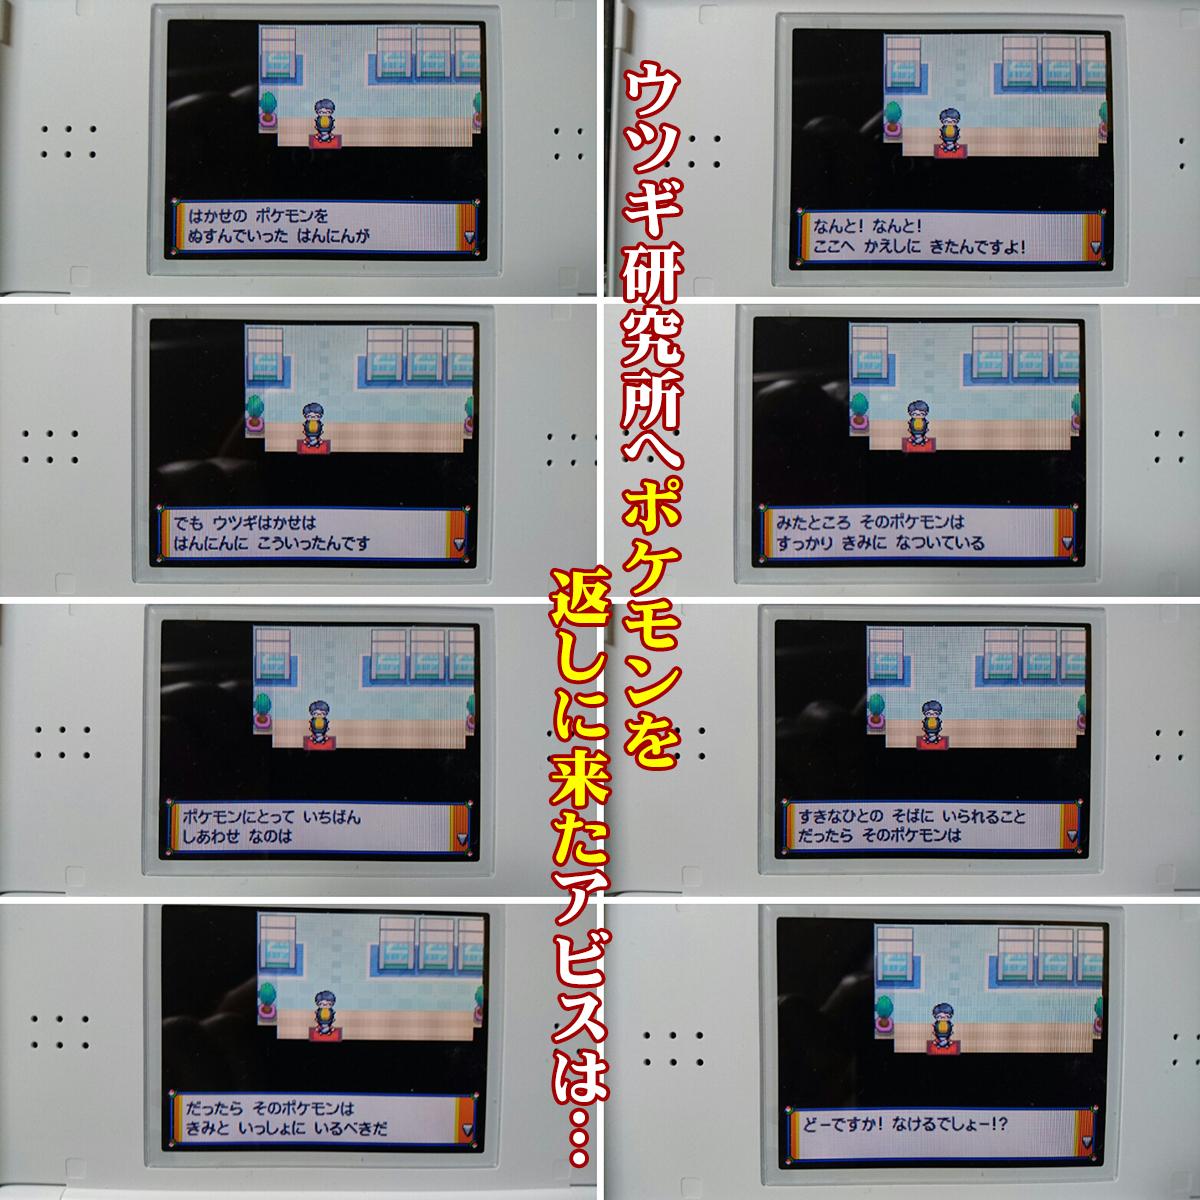 IMG_20170306_233536.jpg